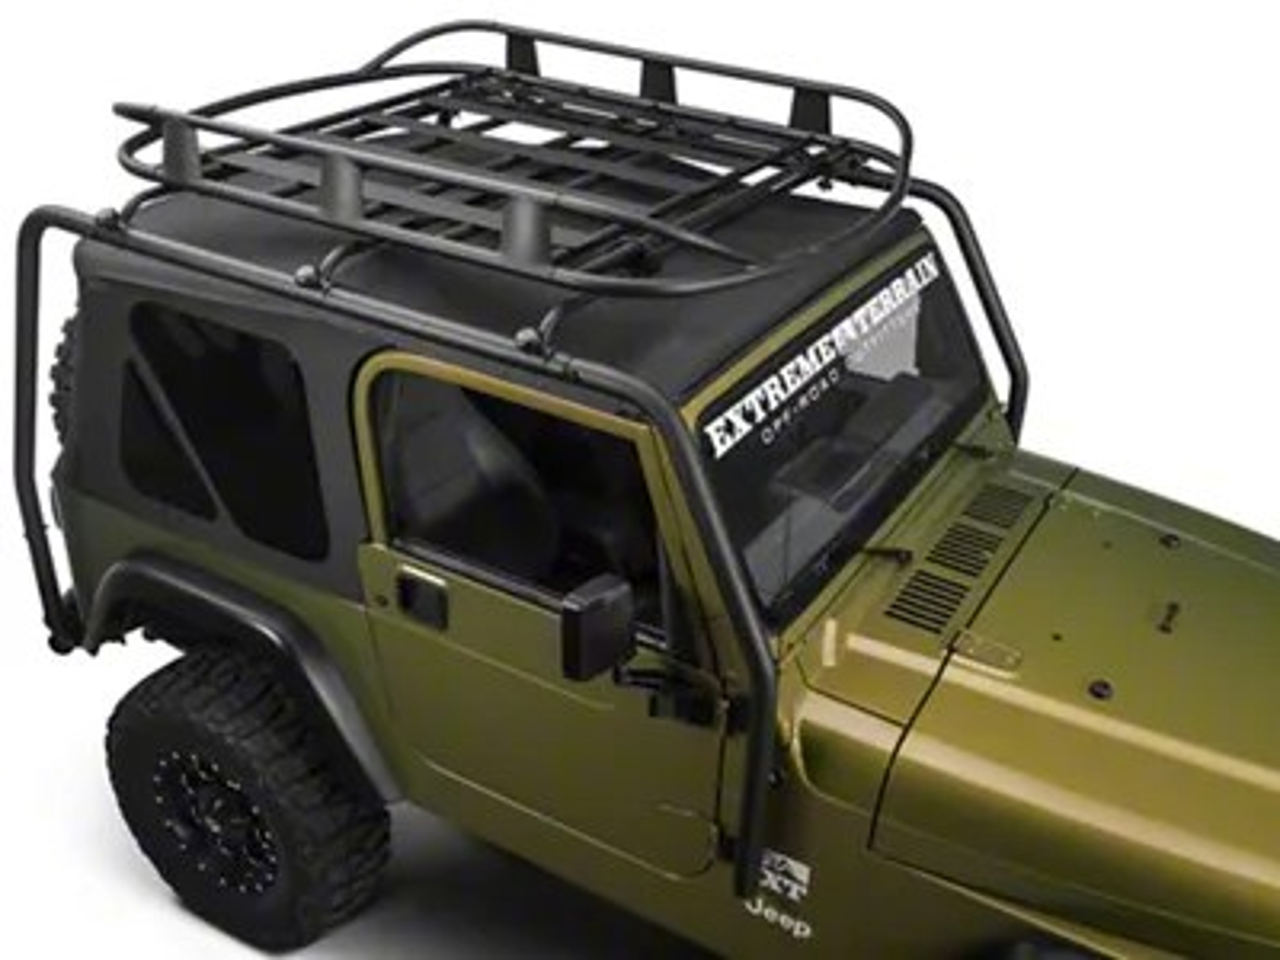 barricade roof rack basket textured black 87 06 jeep wrangler yj tj